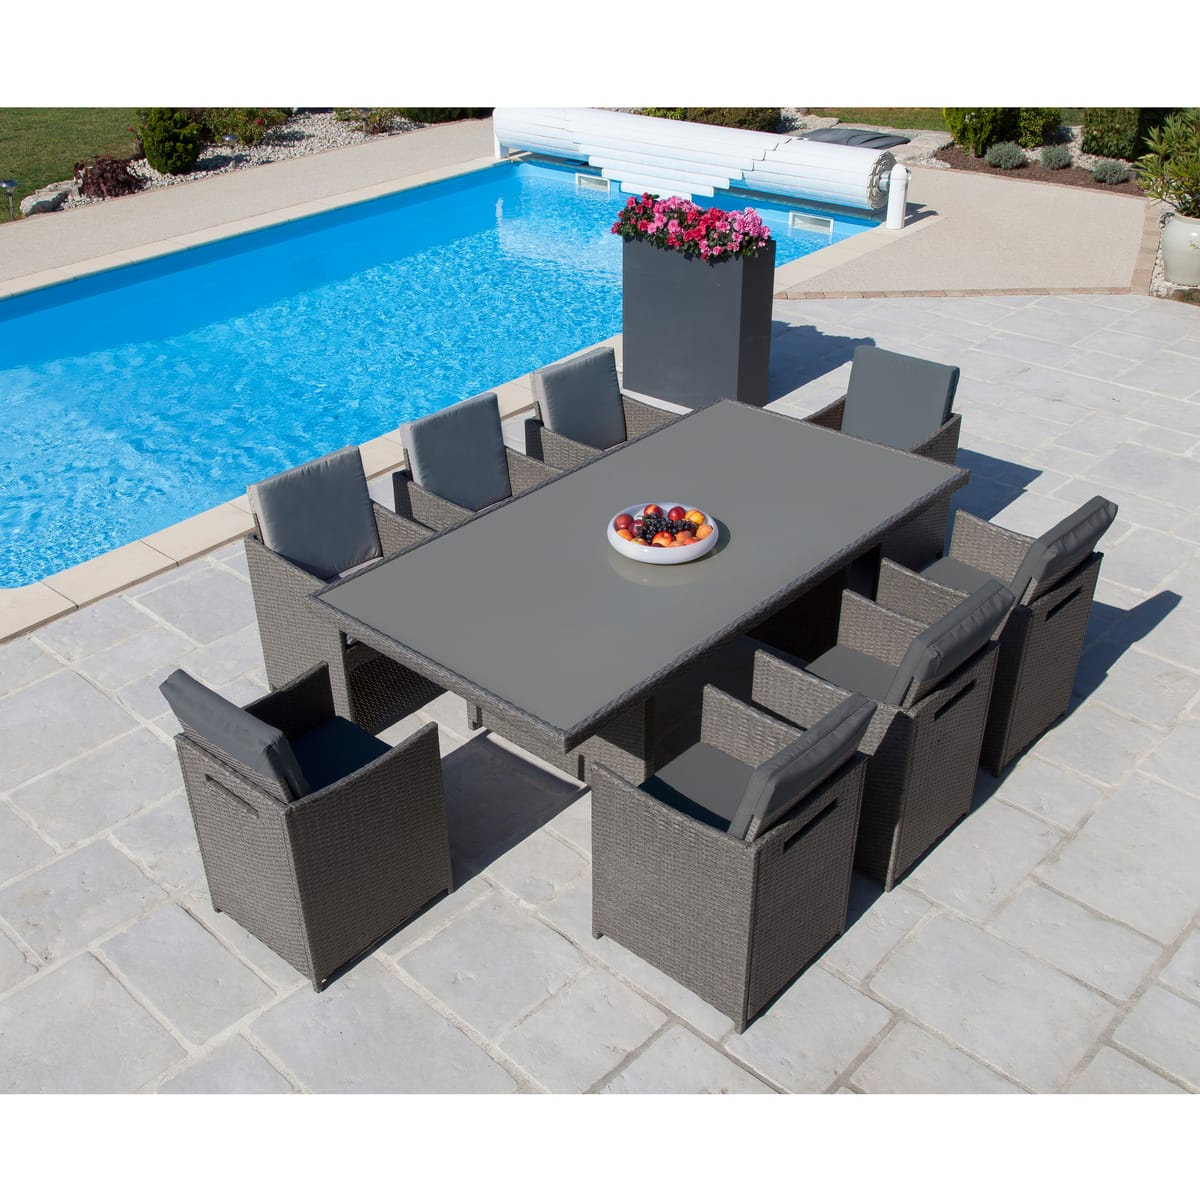 salon de jardin en plastique 8 places topiwall. Black Bedroom Furniture Sets. Home Design Ideas